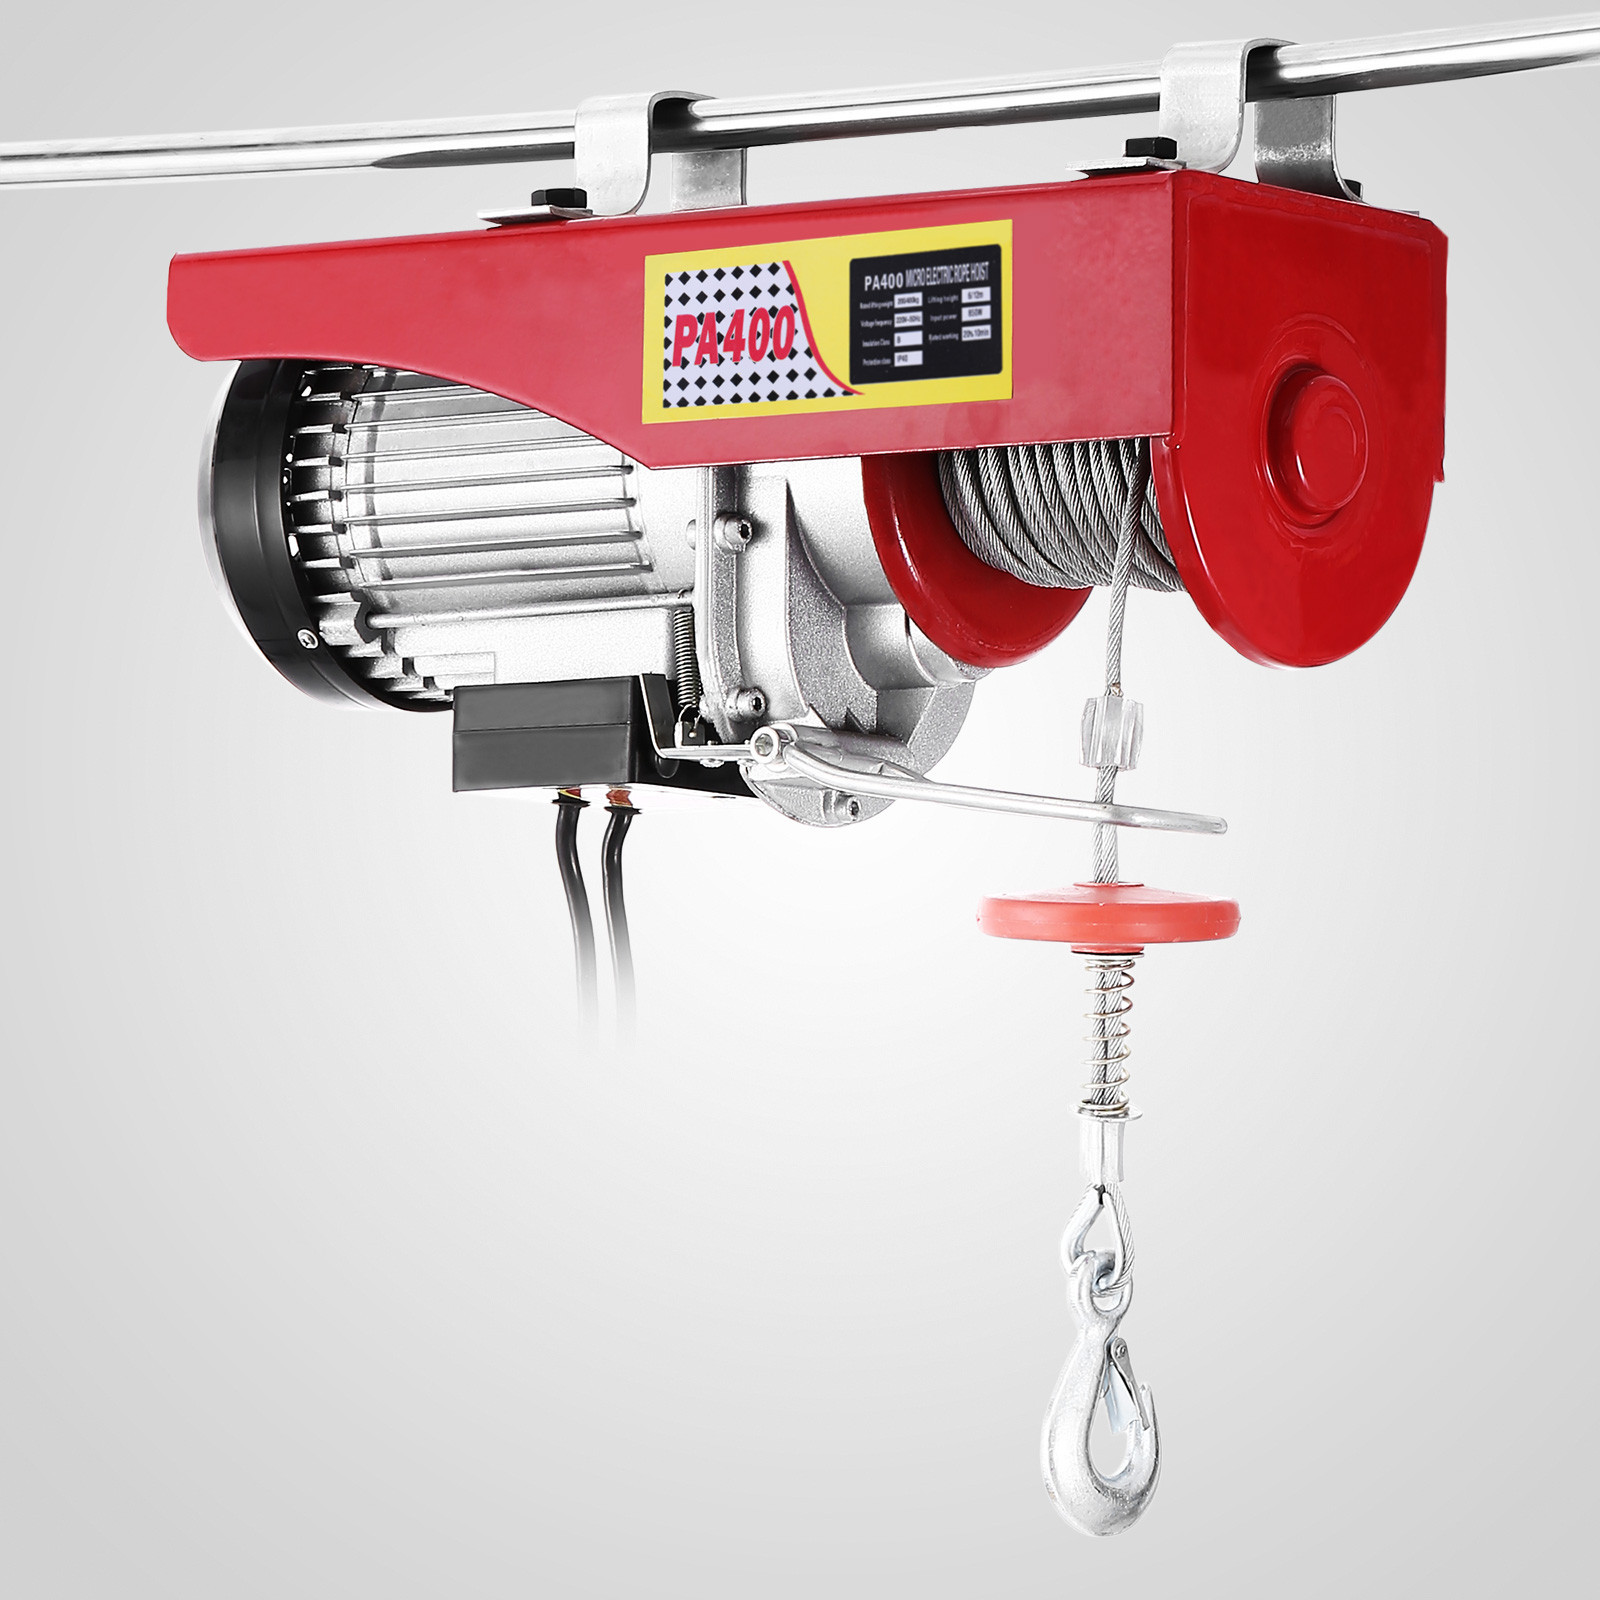 100kg-900kg-Electric-Hoist-Winch-Lifting-Engine-Crane-Cable-Lift-Hook-Garage miniature 27